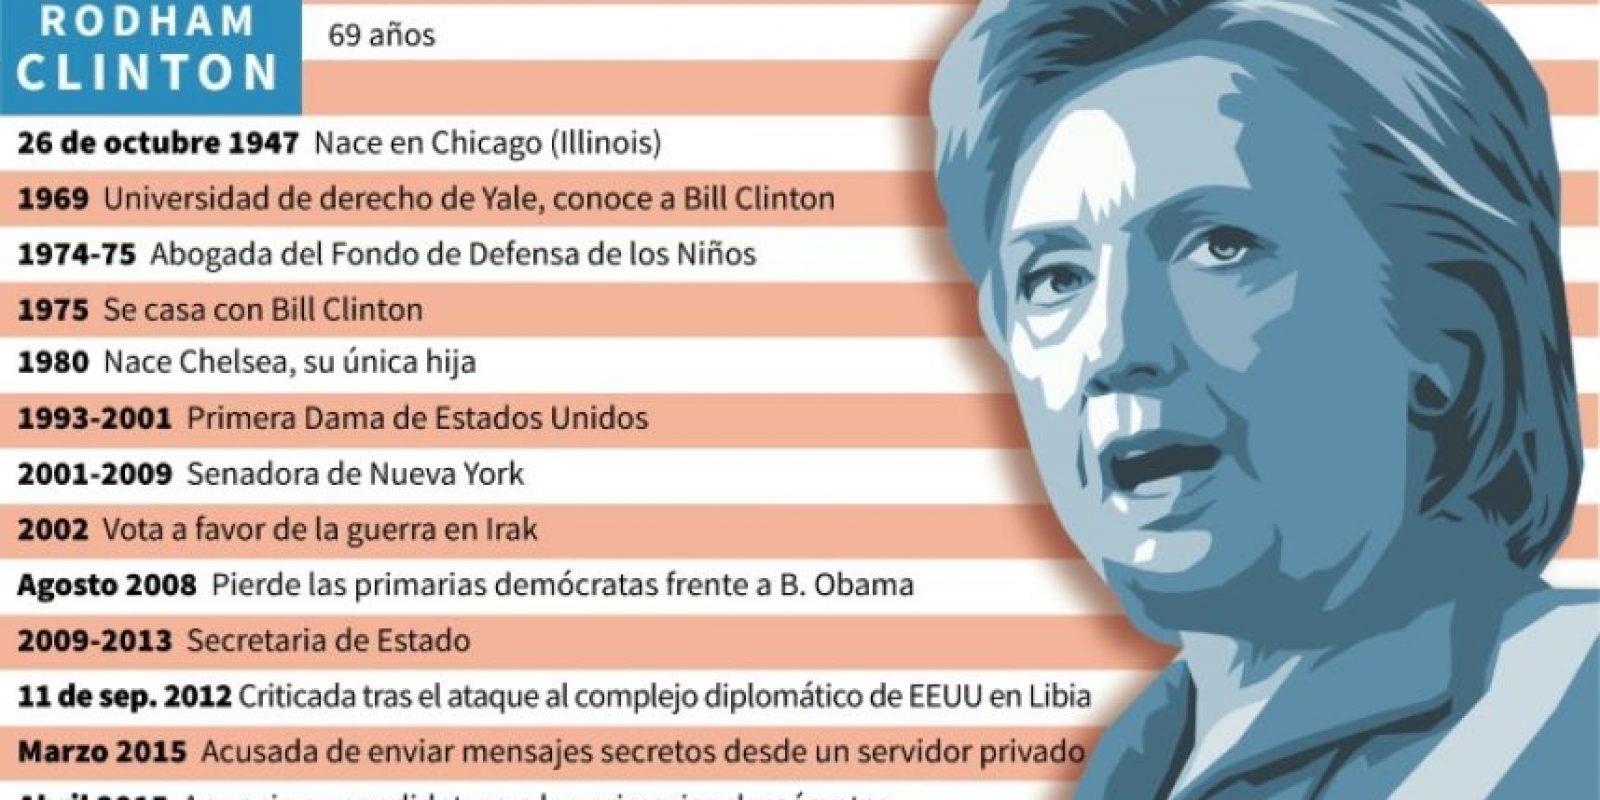 Hillary Clinton Foto:Philippe MOUCHE/afp.com